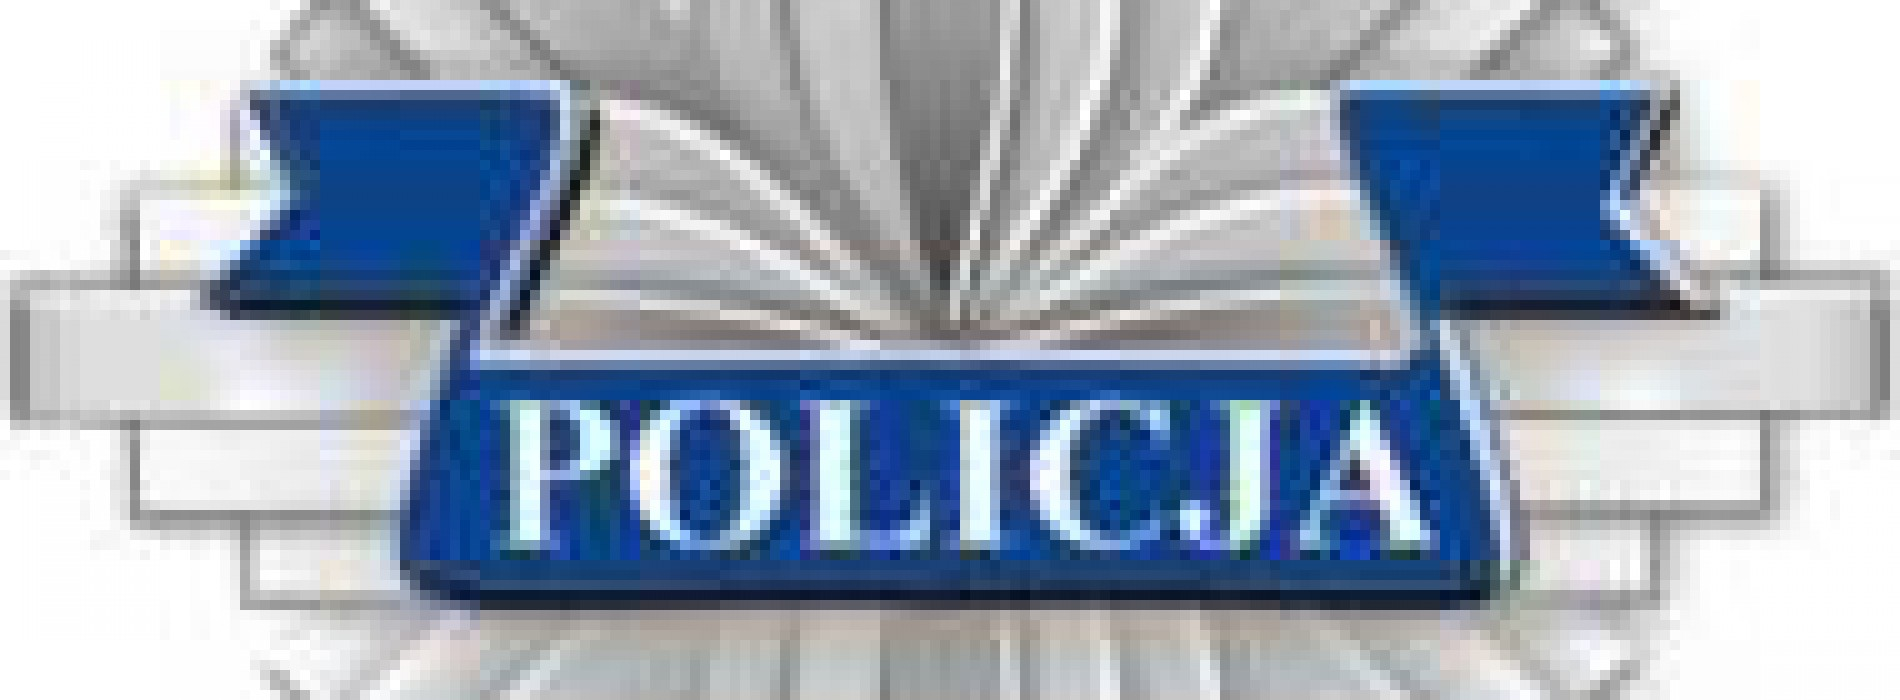 Kutno: 29 – latek zginął podczas szamotaniny z policjantem